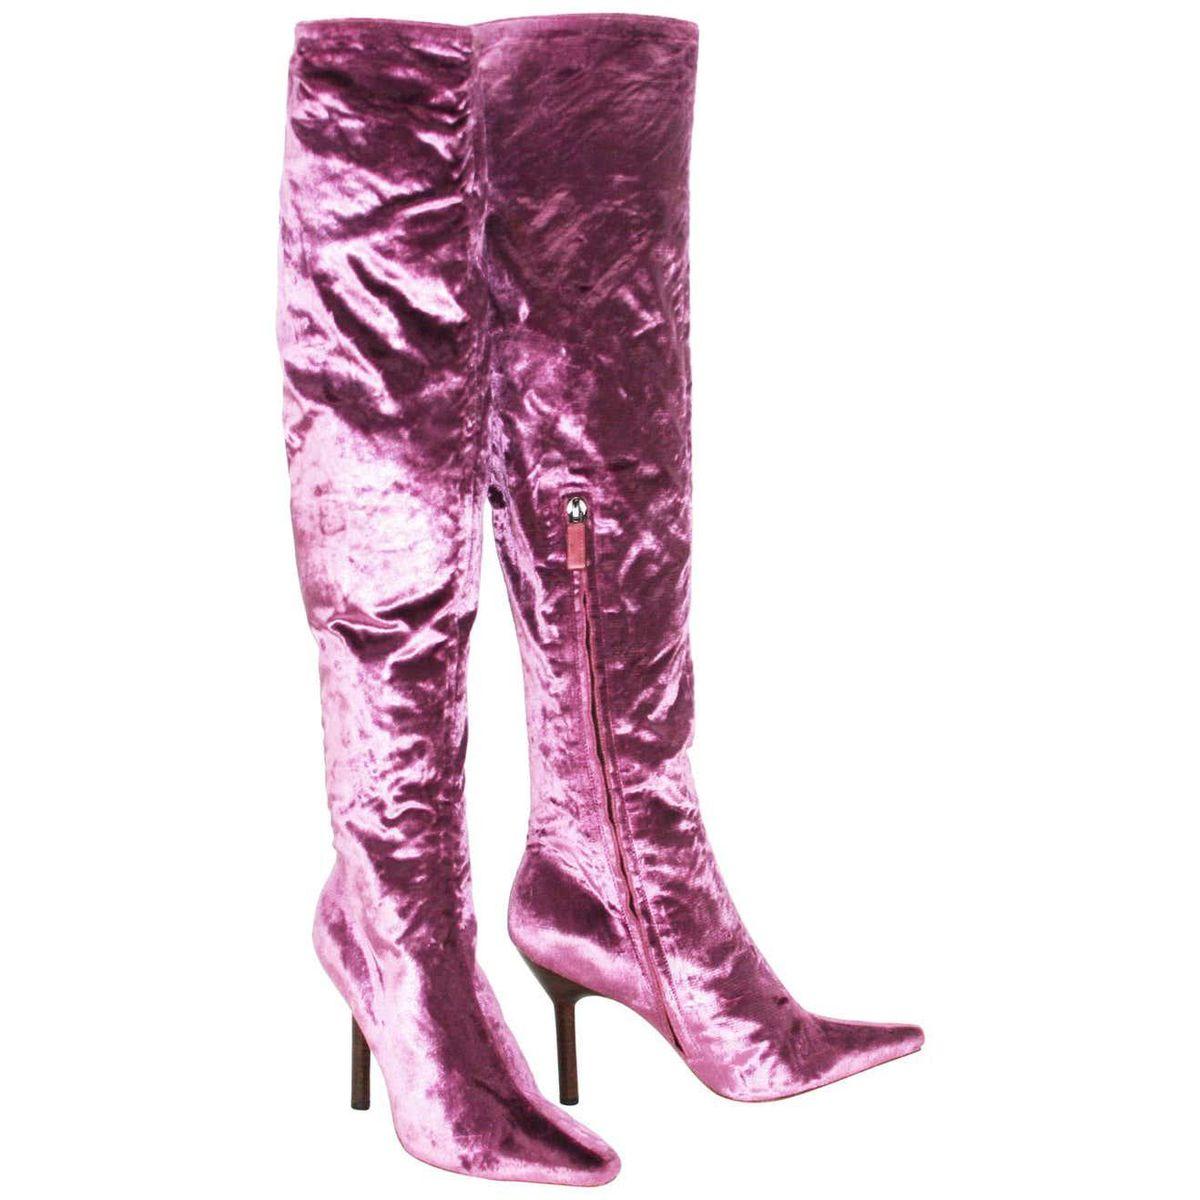 Tom Ford for Gucci Vintage F/W 1999 Pink Velvet Over Knee Boots